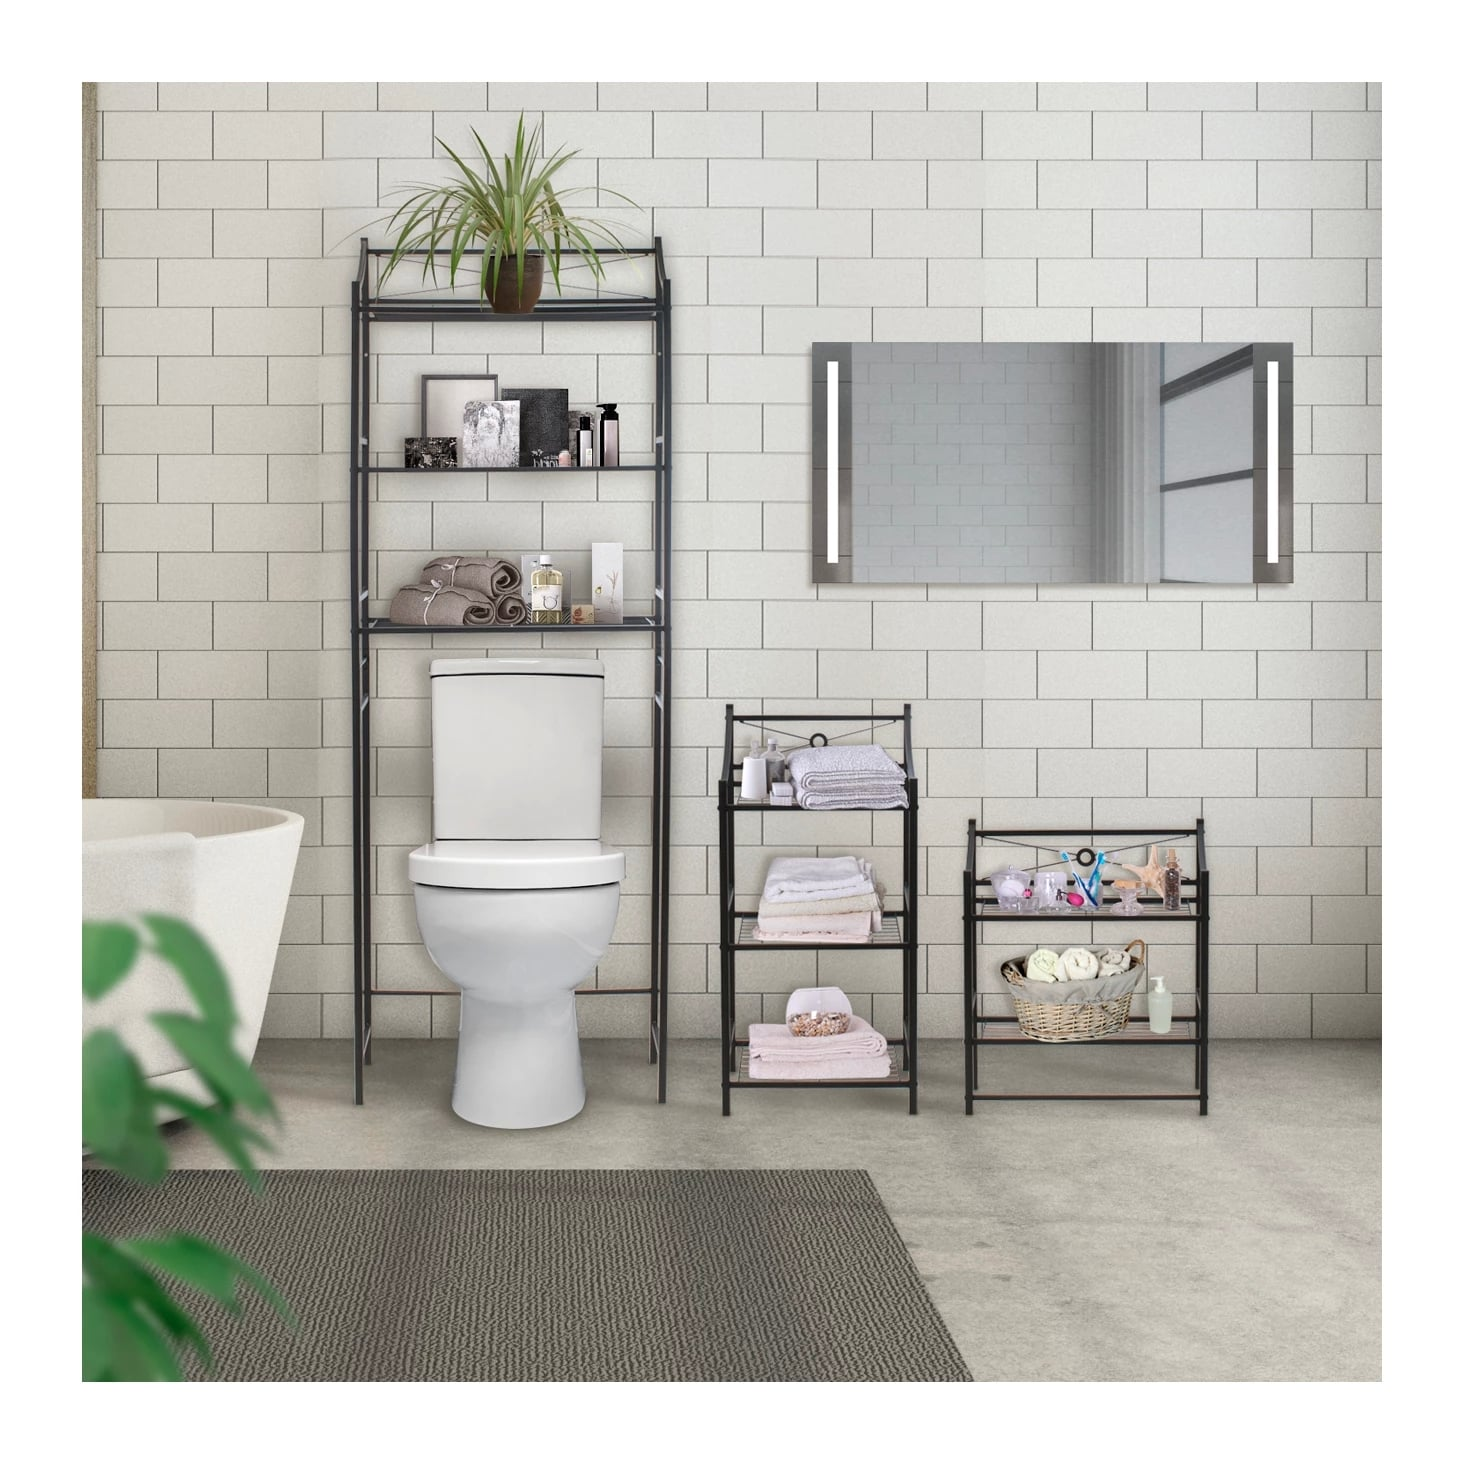 Target Bathroom Organizer | Sorbus Bathroom Organizer Go Ahead And Thank Target Now